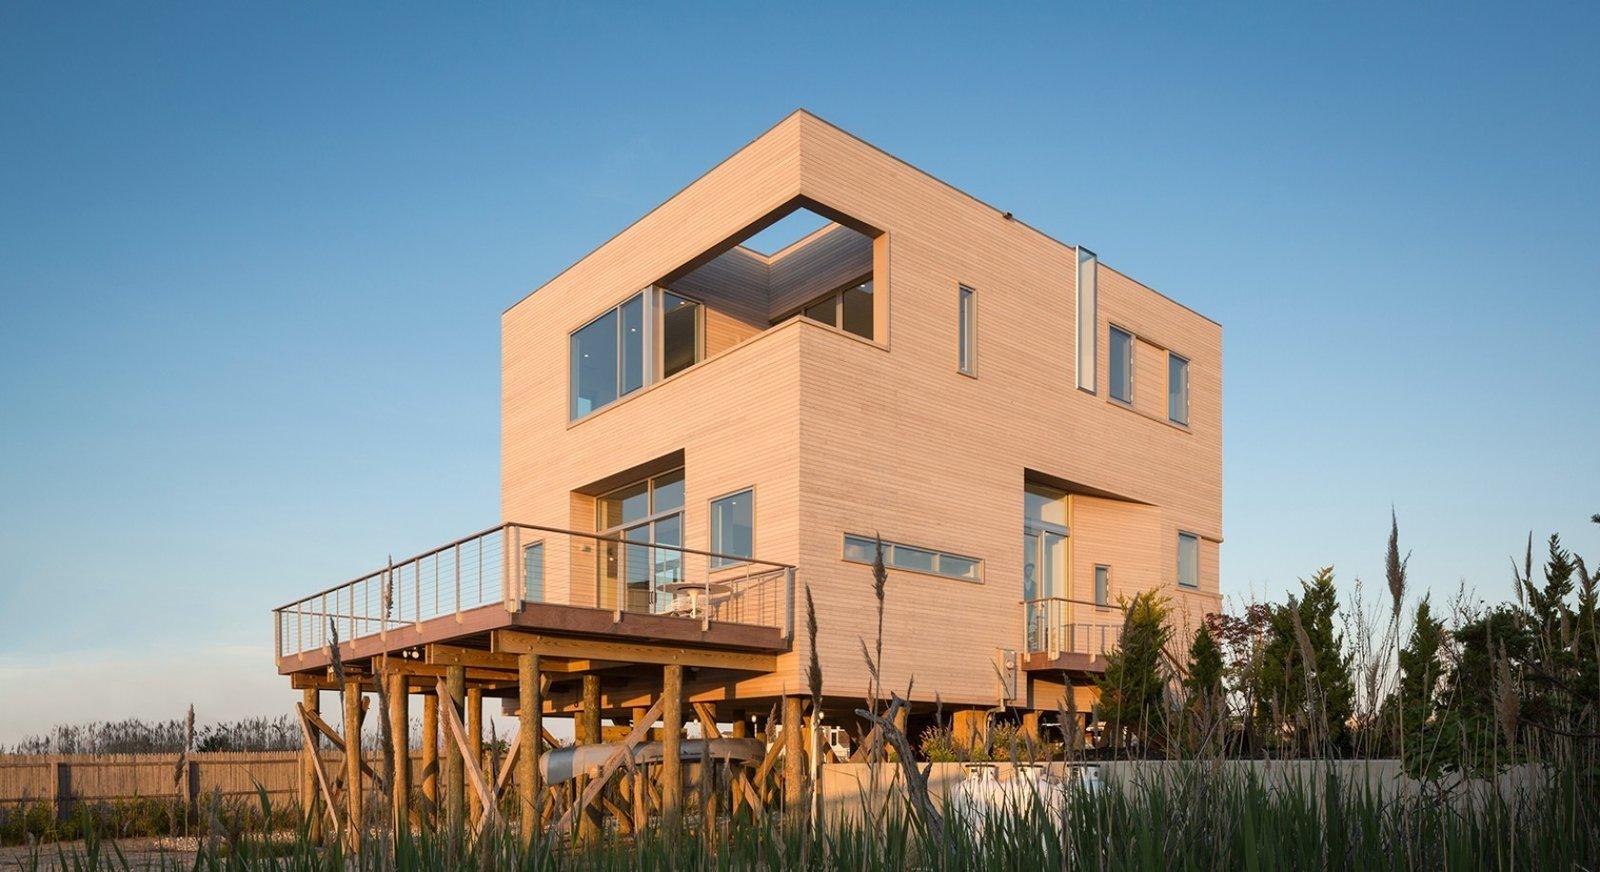 #CubeHouse #modern #cube #exterior #outside #landscape #windows #deck #timber #wetlands #cedar #retreat #privacy #dynamic #naturallighting #Westhamptonbeach #NewYork #LeroyStreetStudio   Cube House by Leroy Street Studio